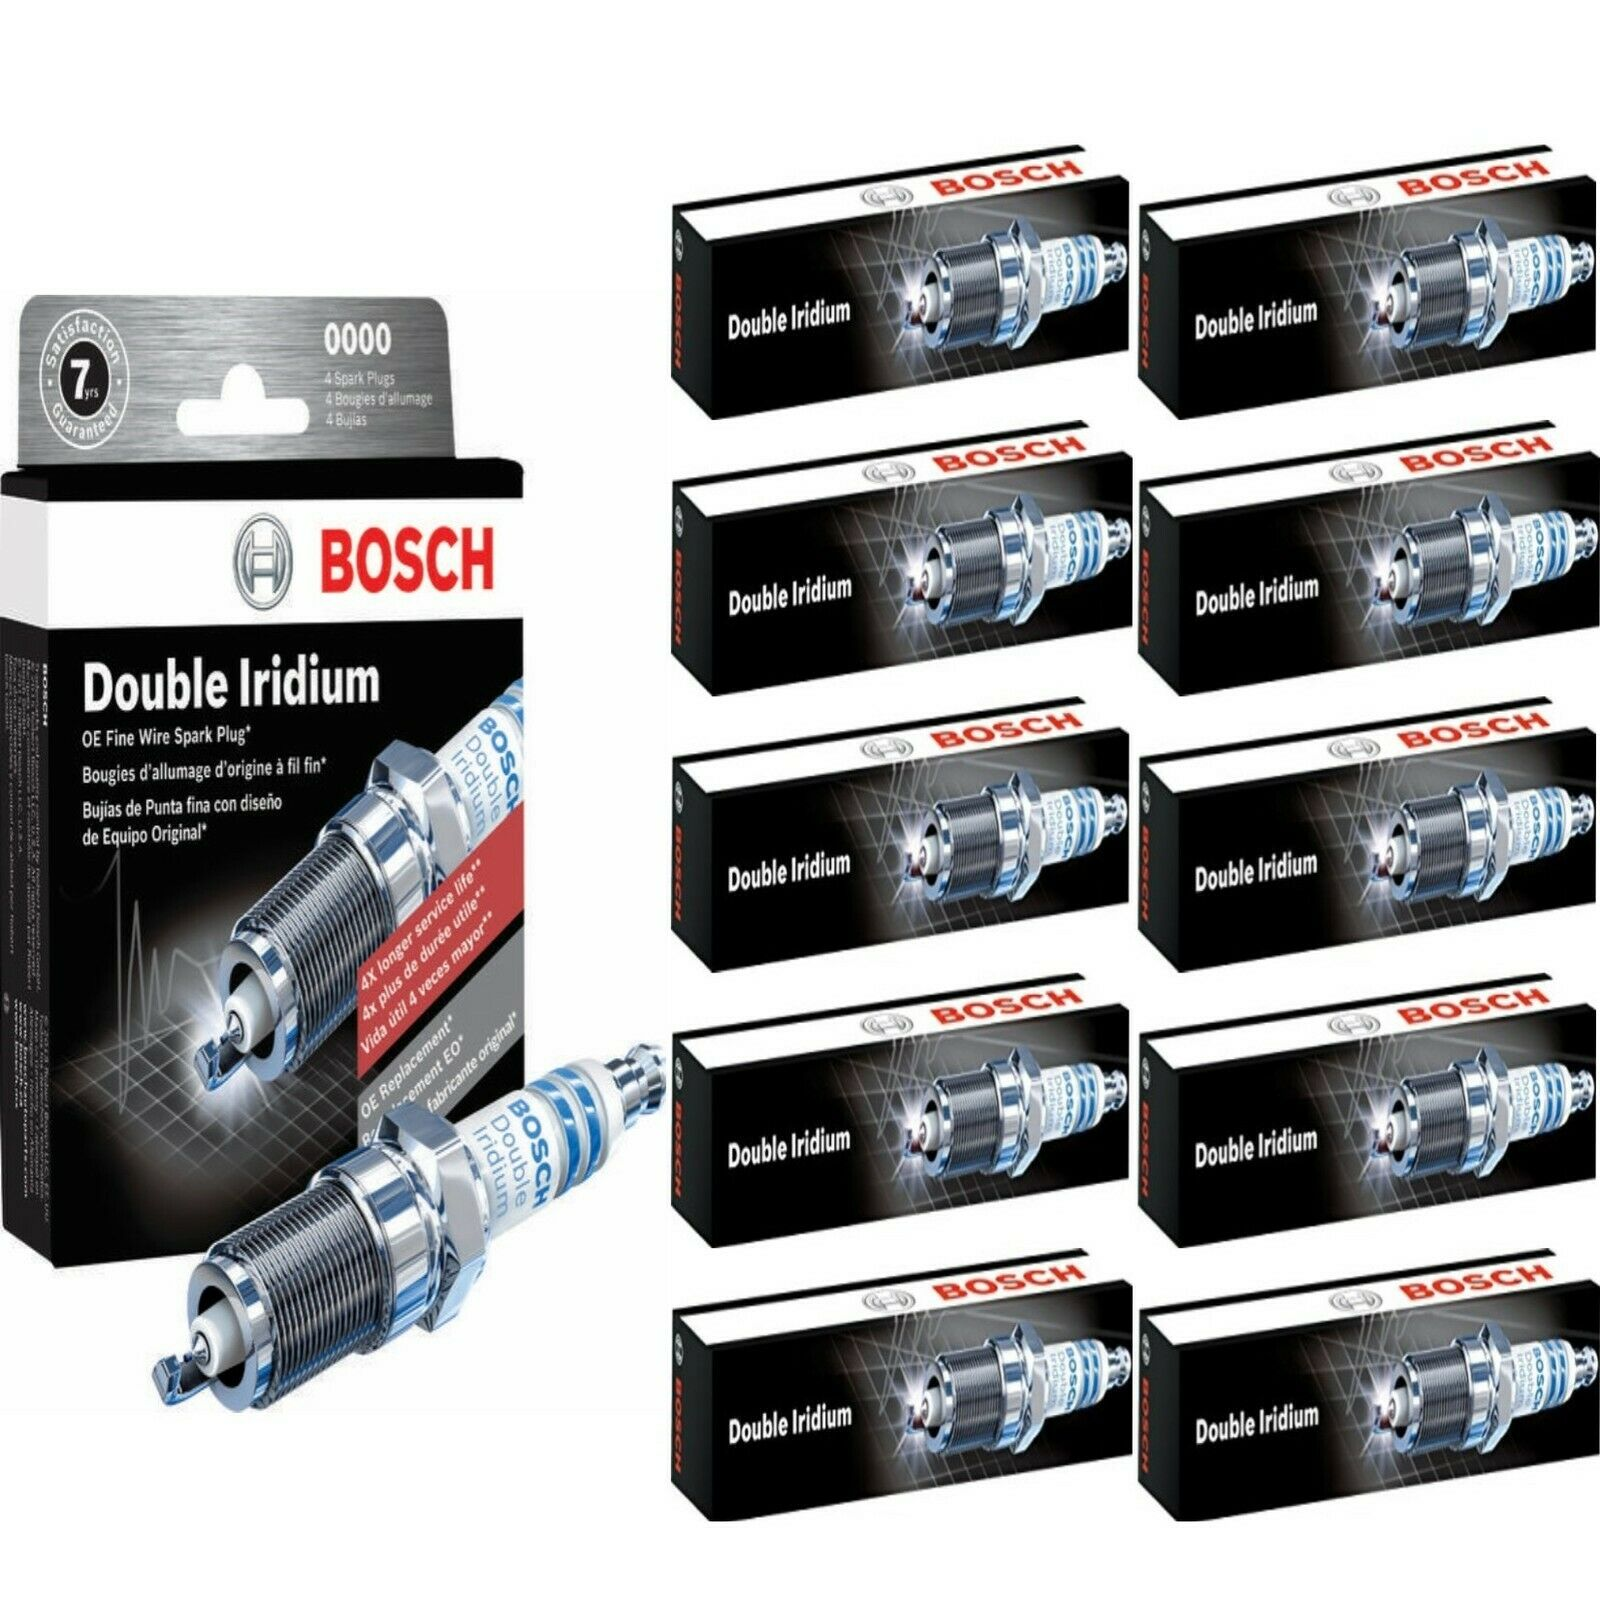 6 X Bosch Double Iridium Spark Plugs For 2010-2016 LINCOLN MKS V6-3.5L